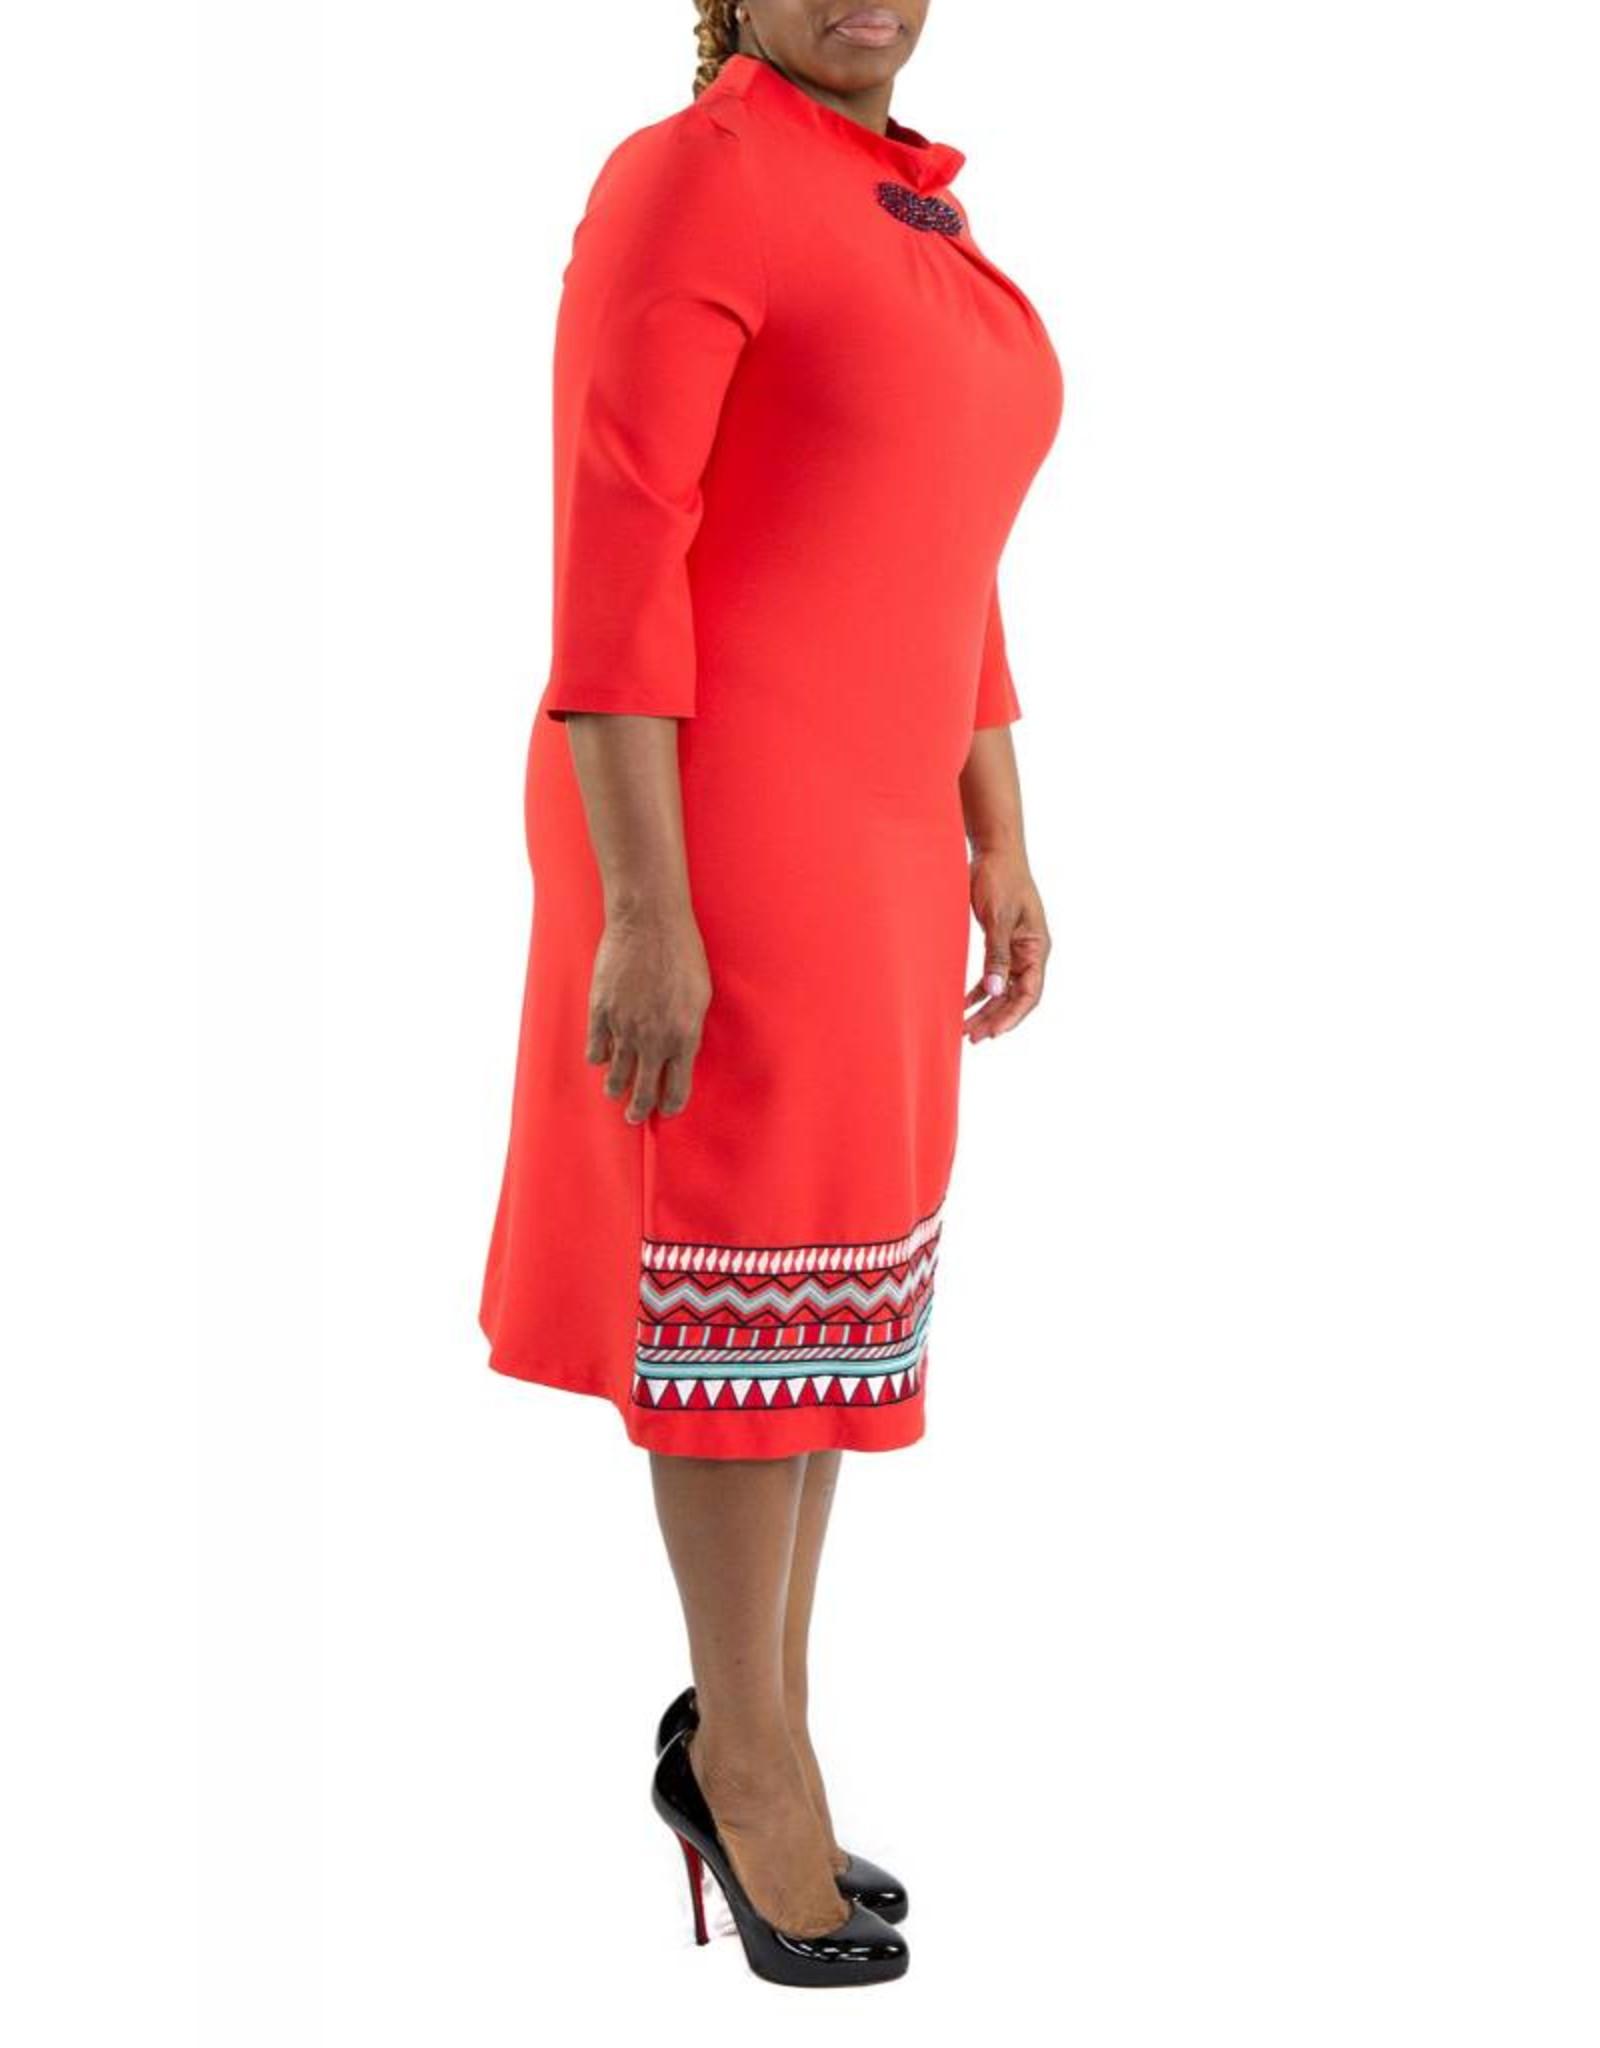 Rowan Dress